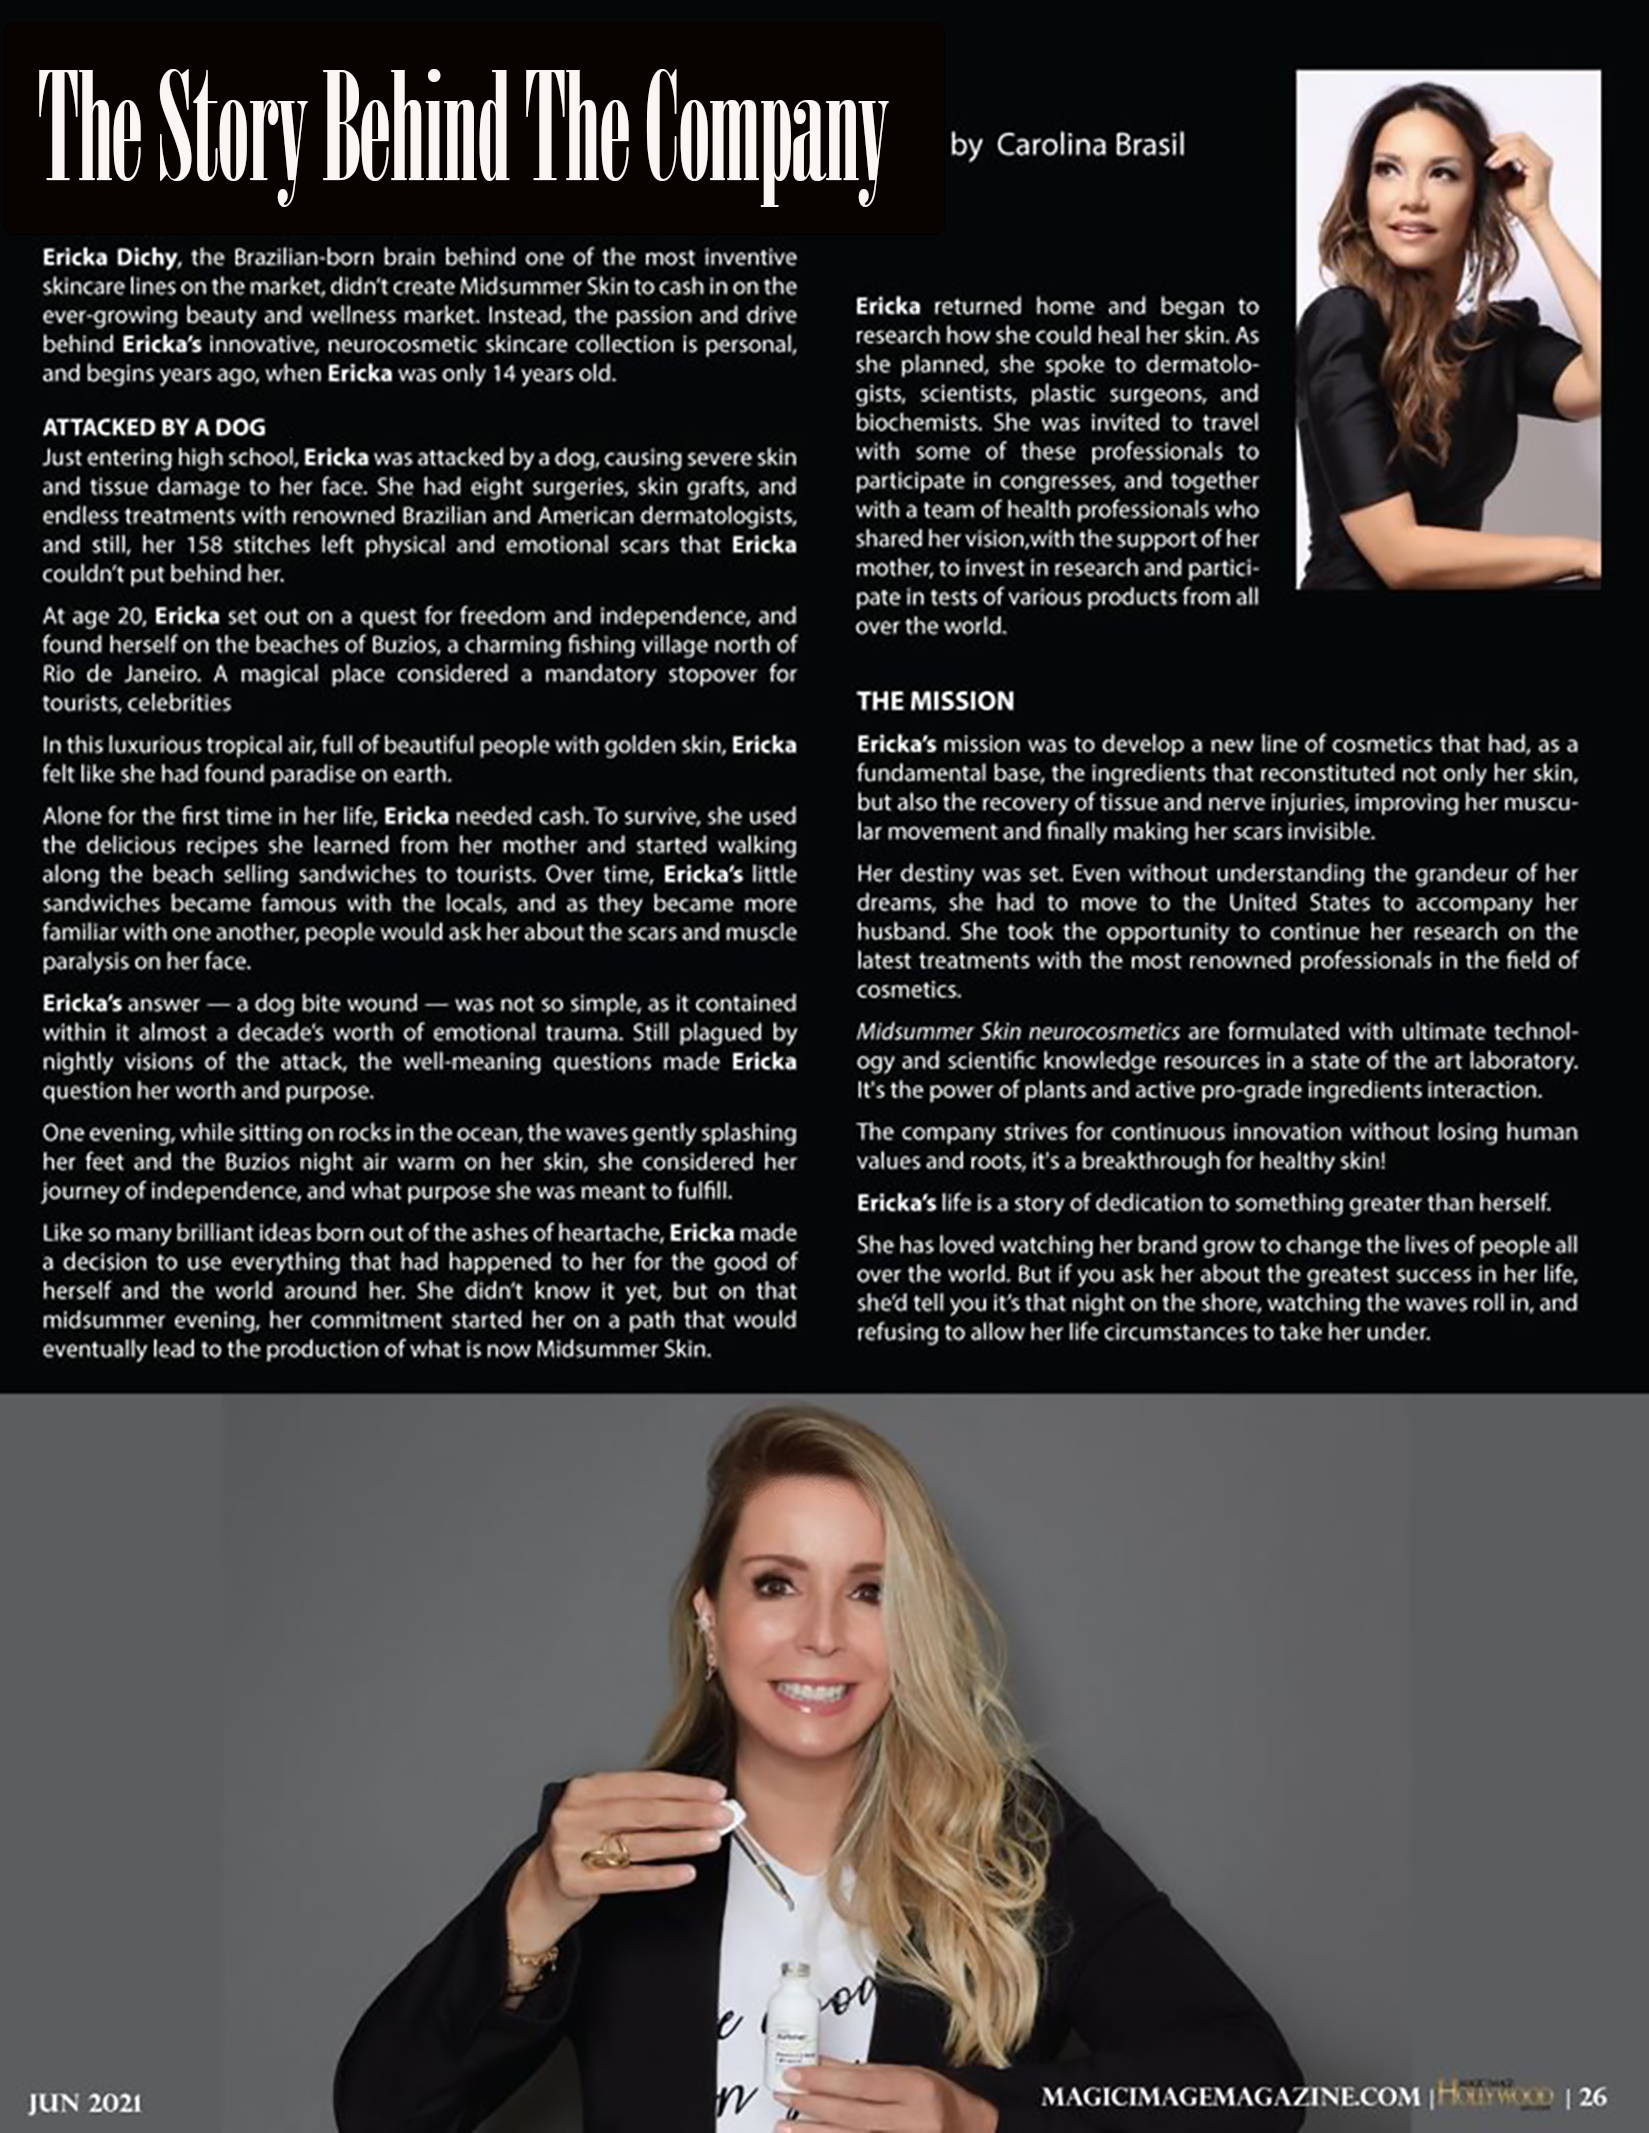 Magic Image Magazine Jun 2021 Emmys Issue Pag 26 Midsummer Skin